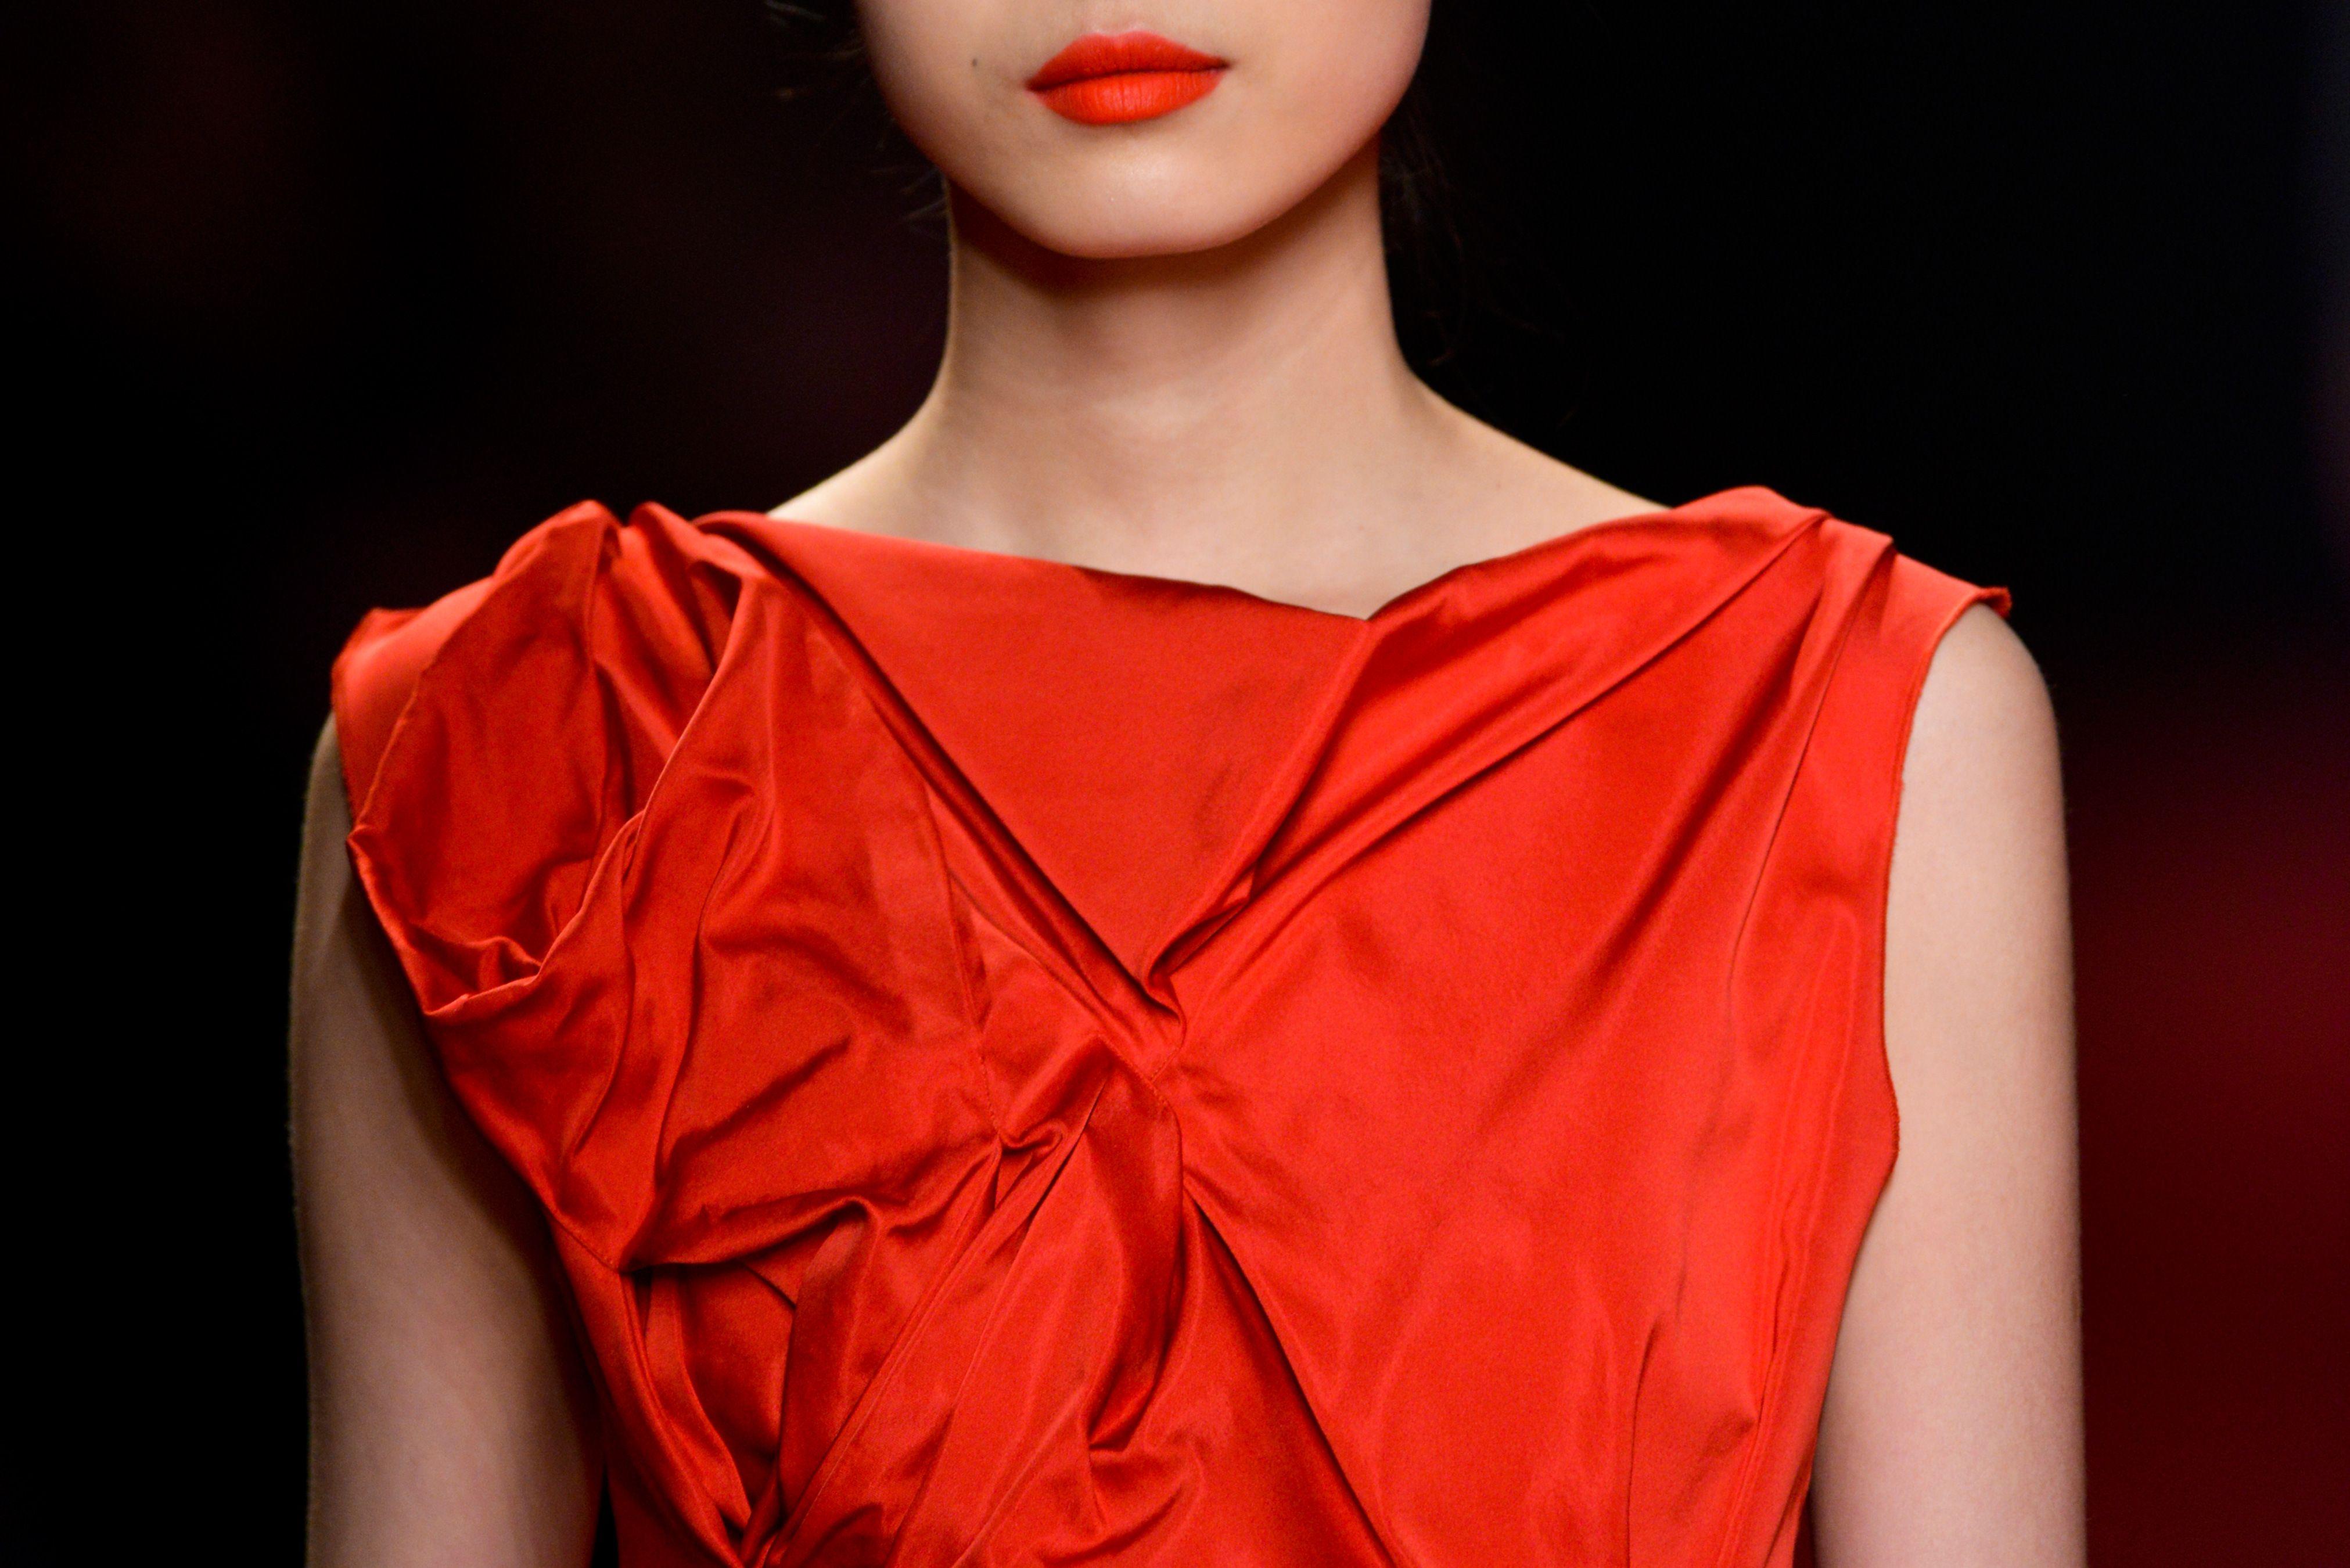 Nina Ricci Details A/W '13